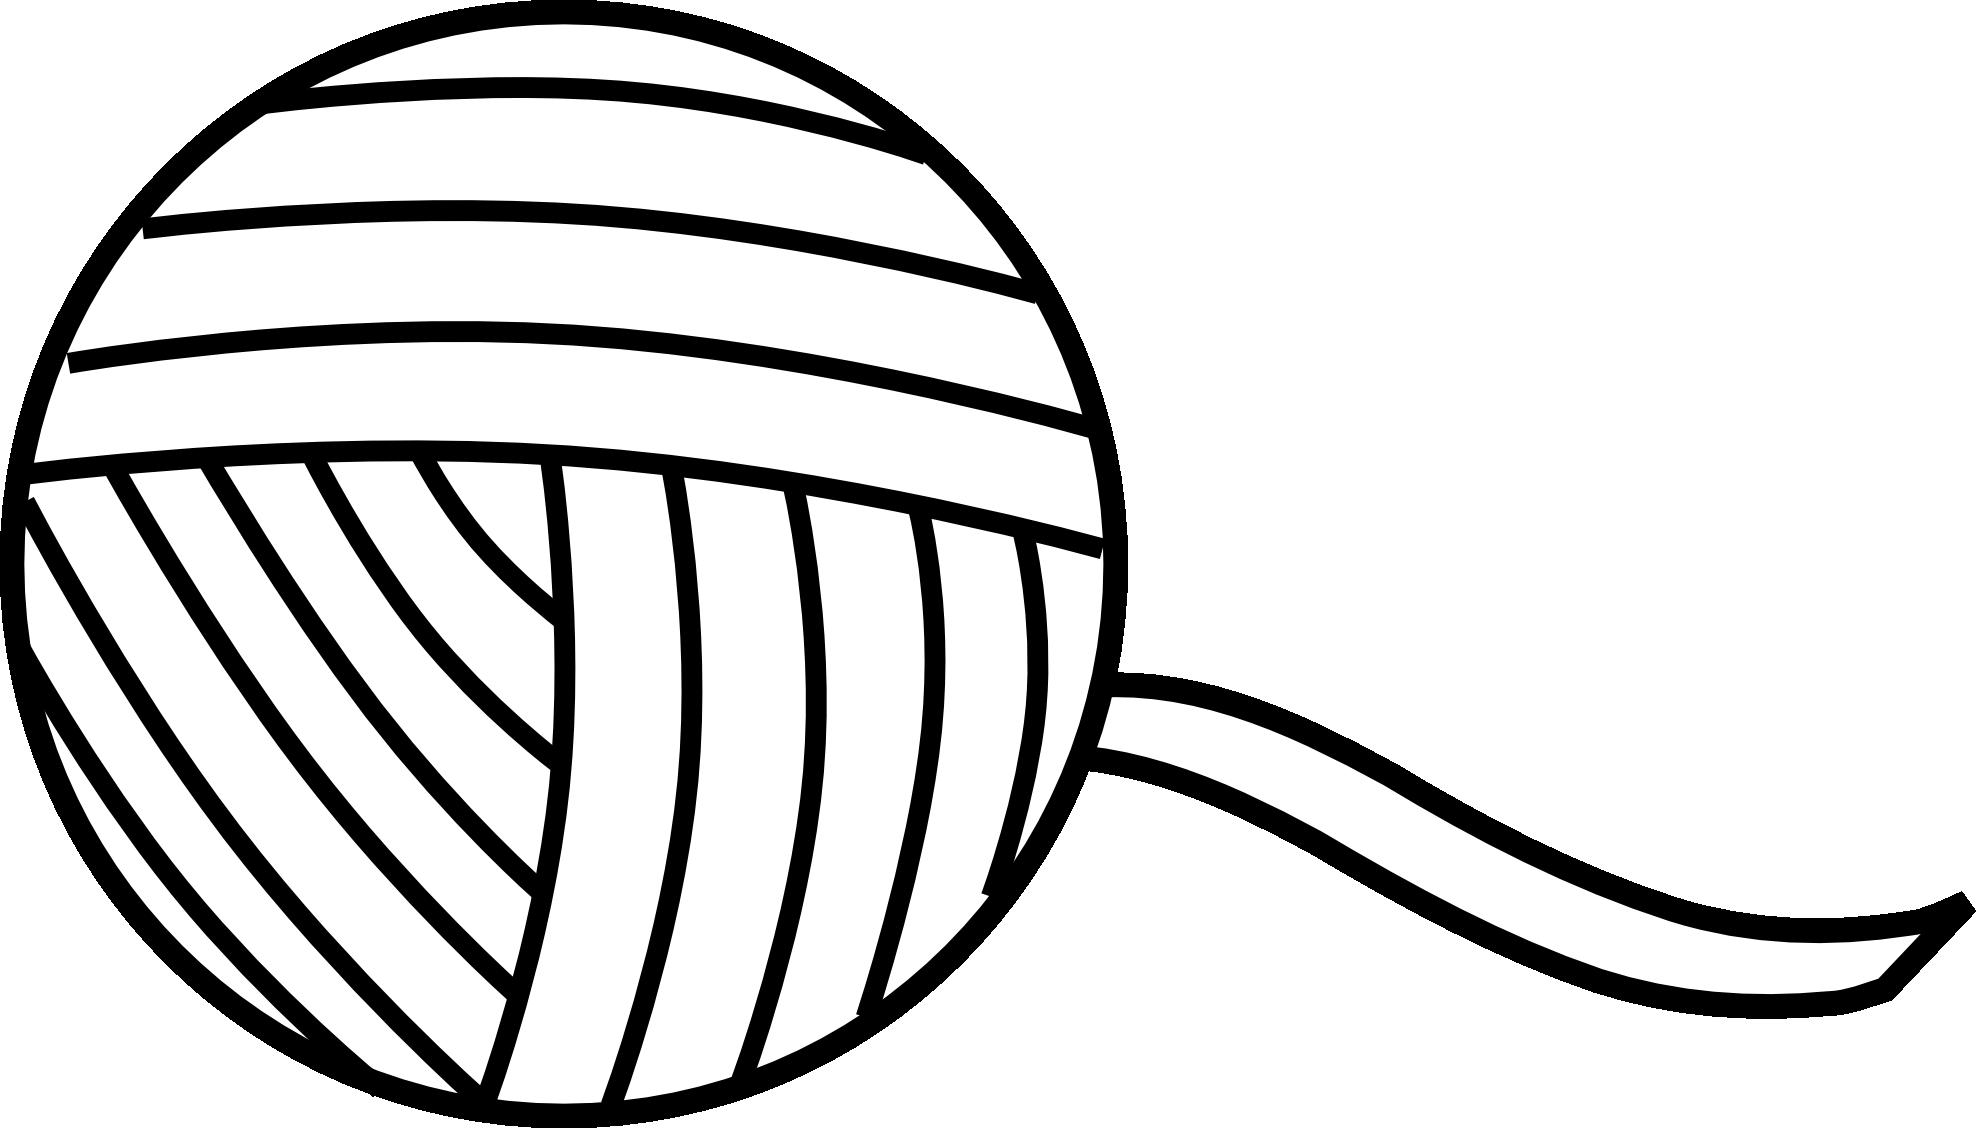 Yarn black and white. Kite clipart kite thread